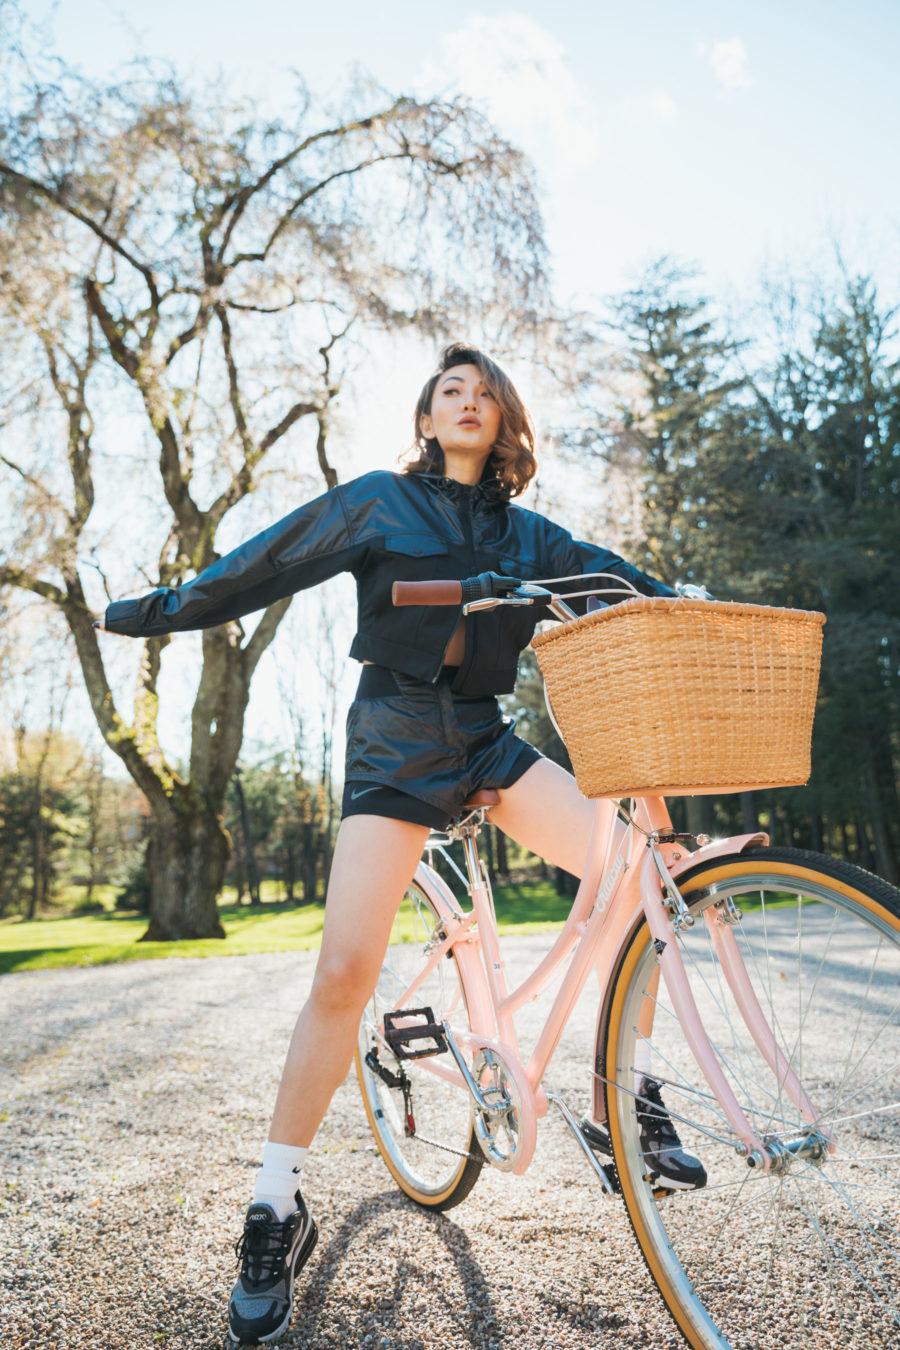 jessica wang wearing a black track jacket, black nike shorts, and nike shoes on a bike while sharing her self-care tips // Jessica Wang - Notjessfashion.com